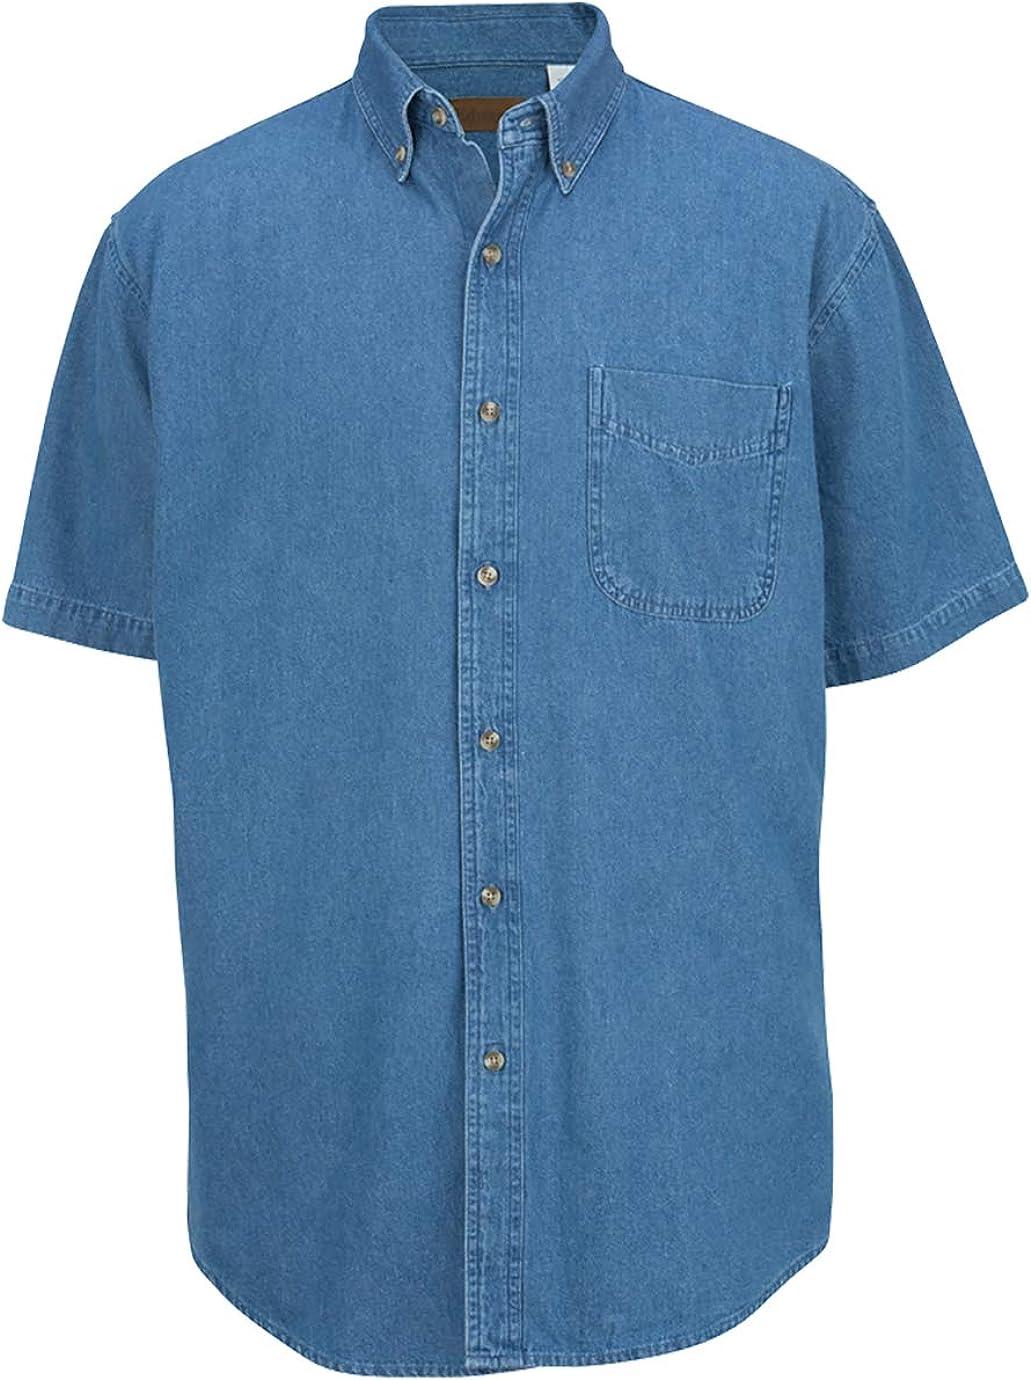 Edwards Denim Midweight Short Sleeve Shirt